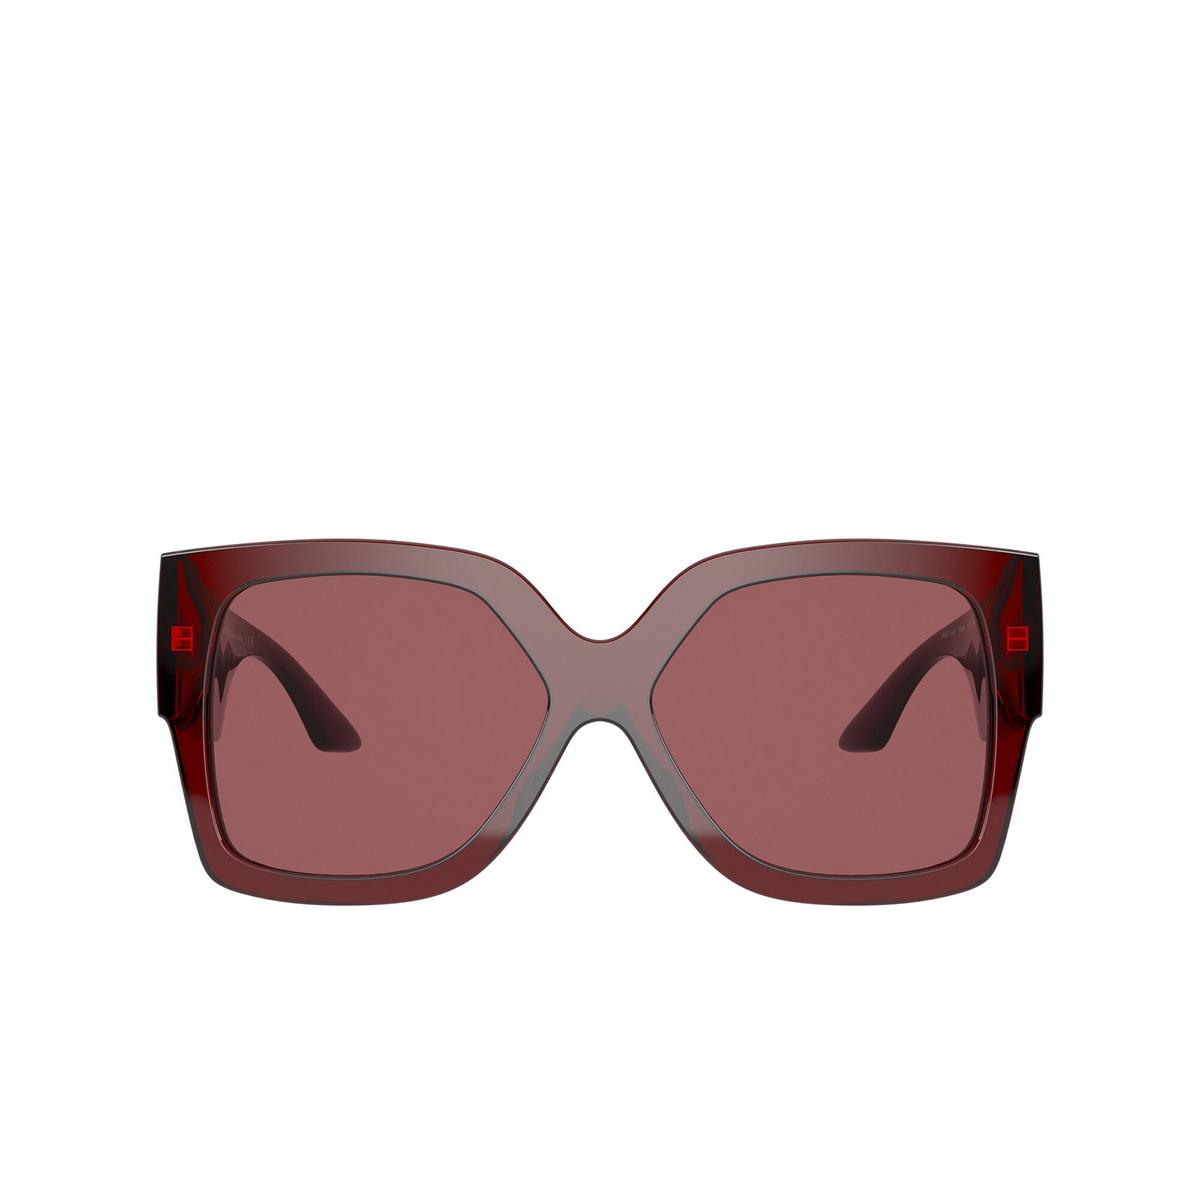 Versace® Square Sunglasses: VE4402 color Transparent Red 388/69 - front view.